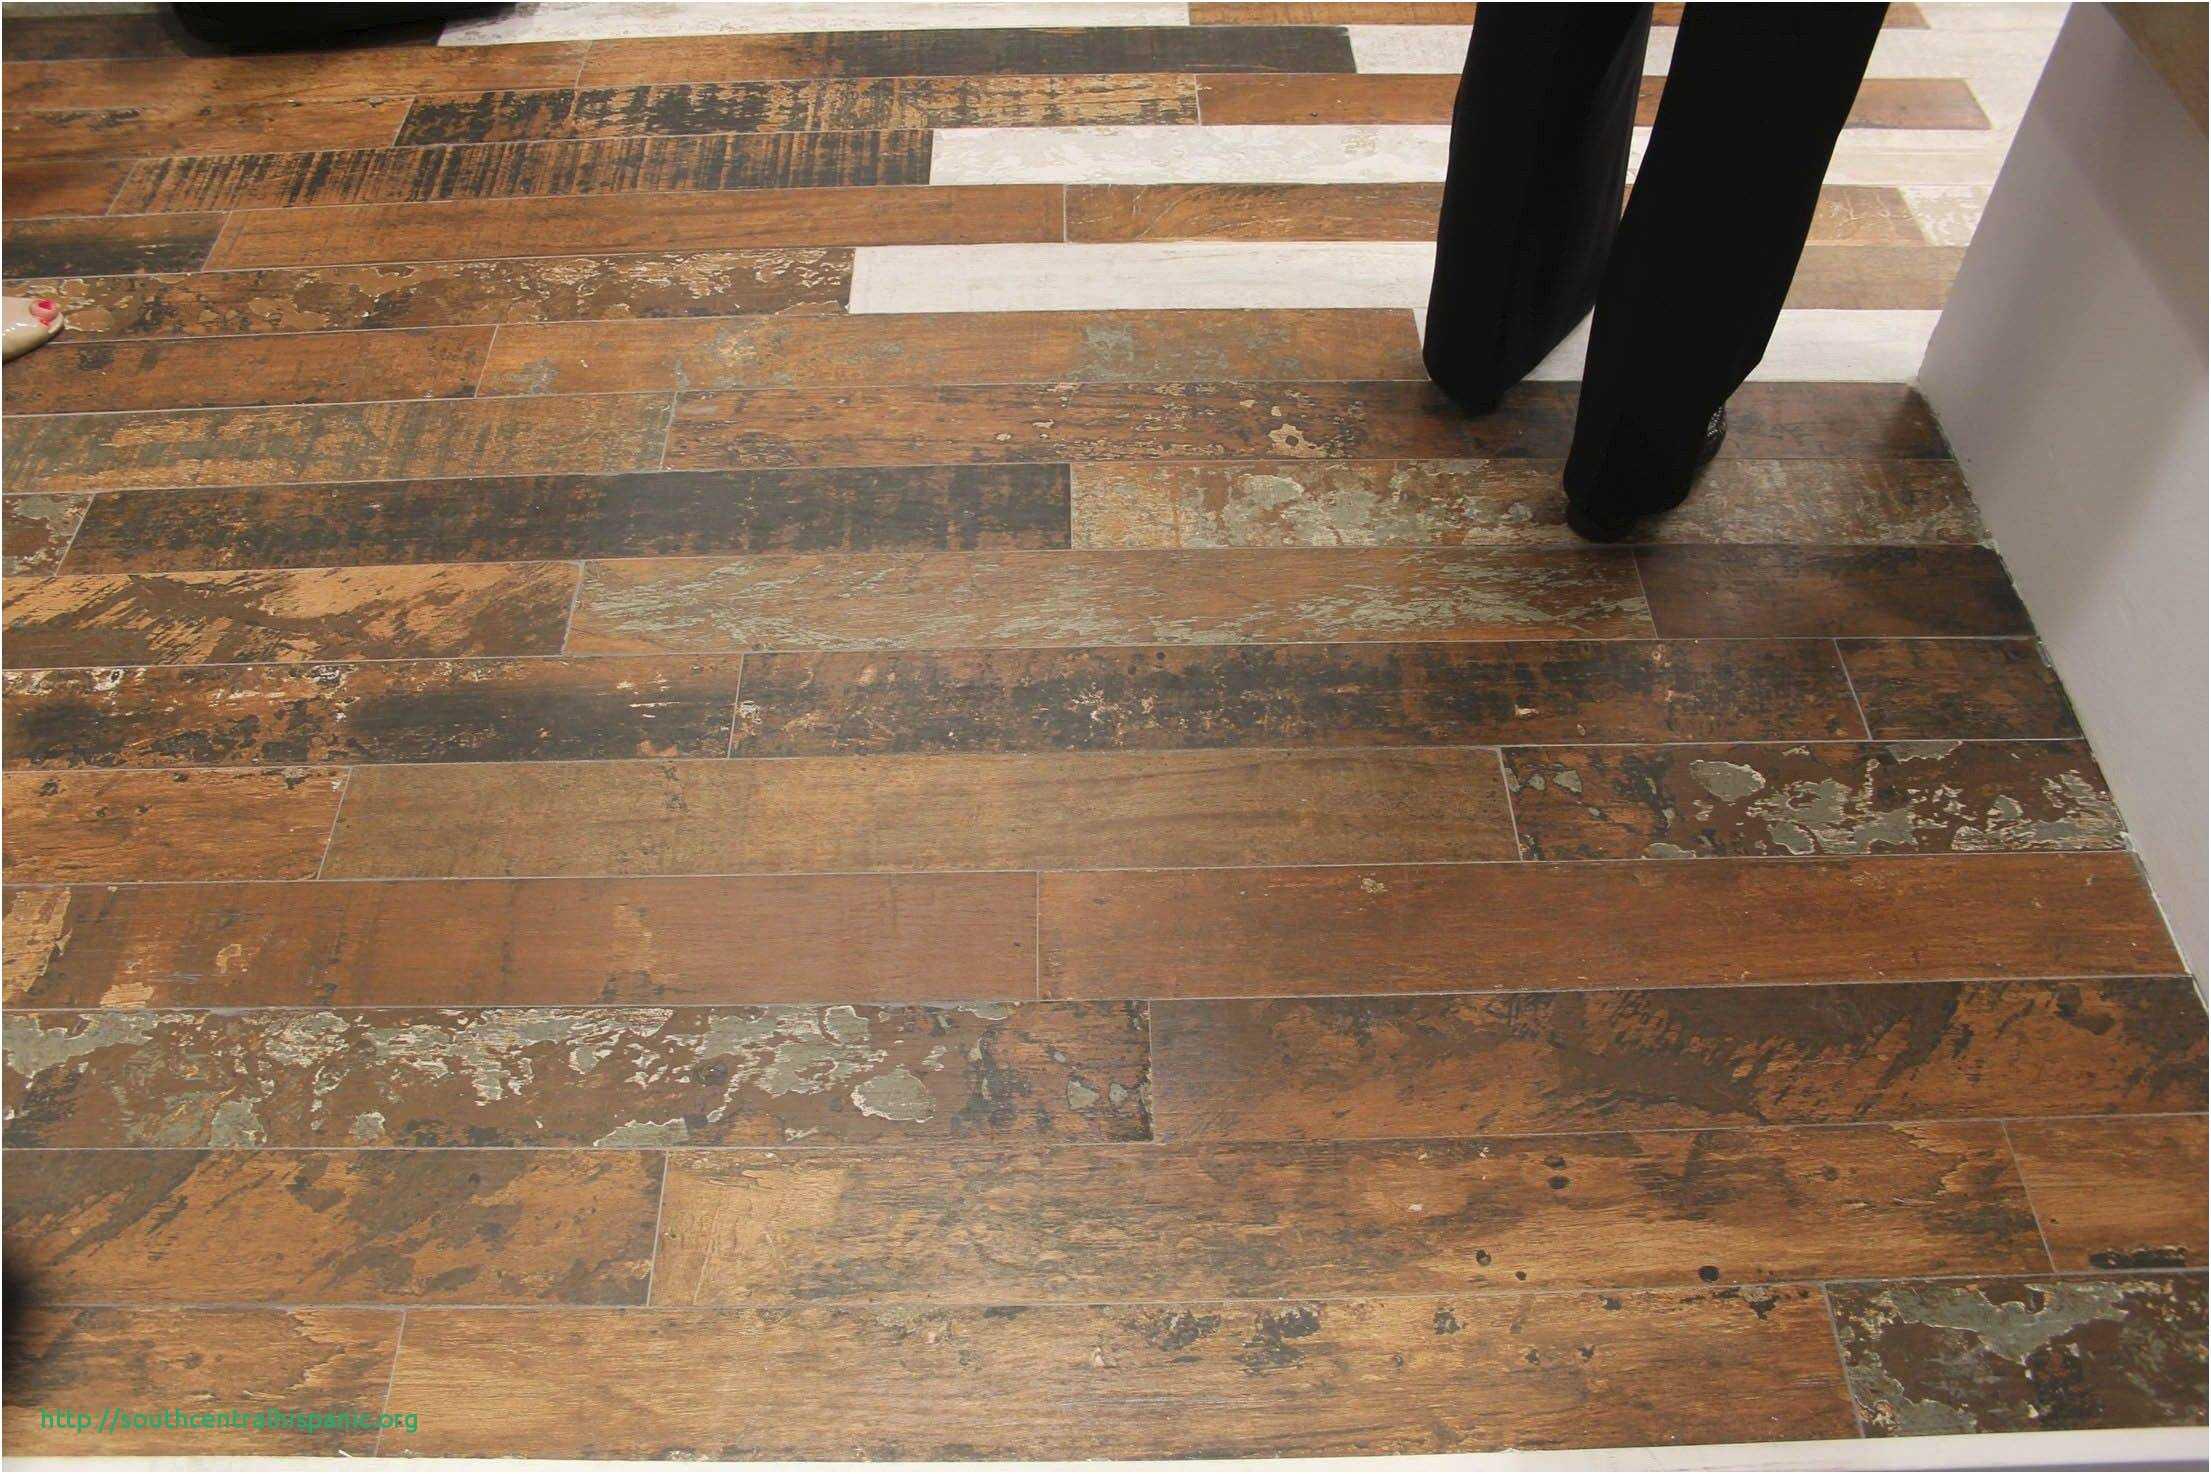 home depot hardwood floor installation special of linoleum flooring at home depot beau lifeproof sterling oak 8 7 in x inside linoleum flooring at home depot frais linoleum that looks like hardwood floors